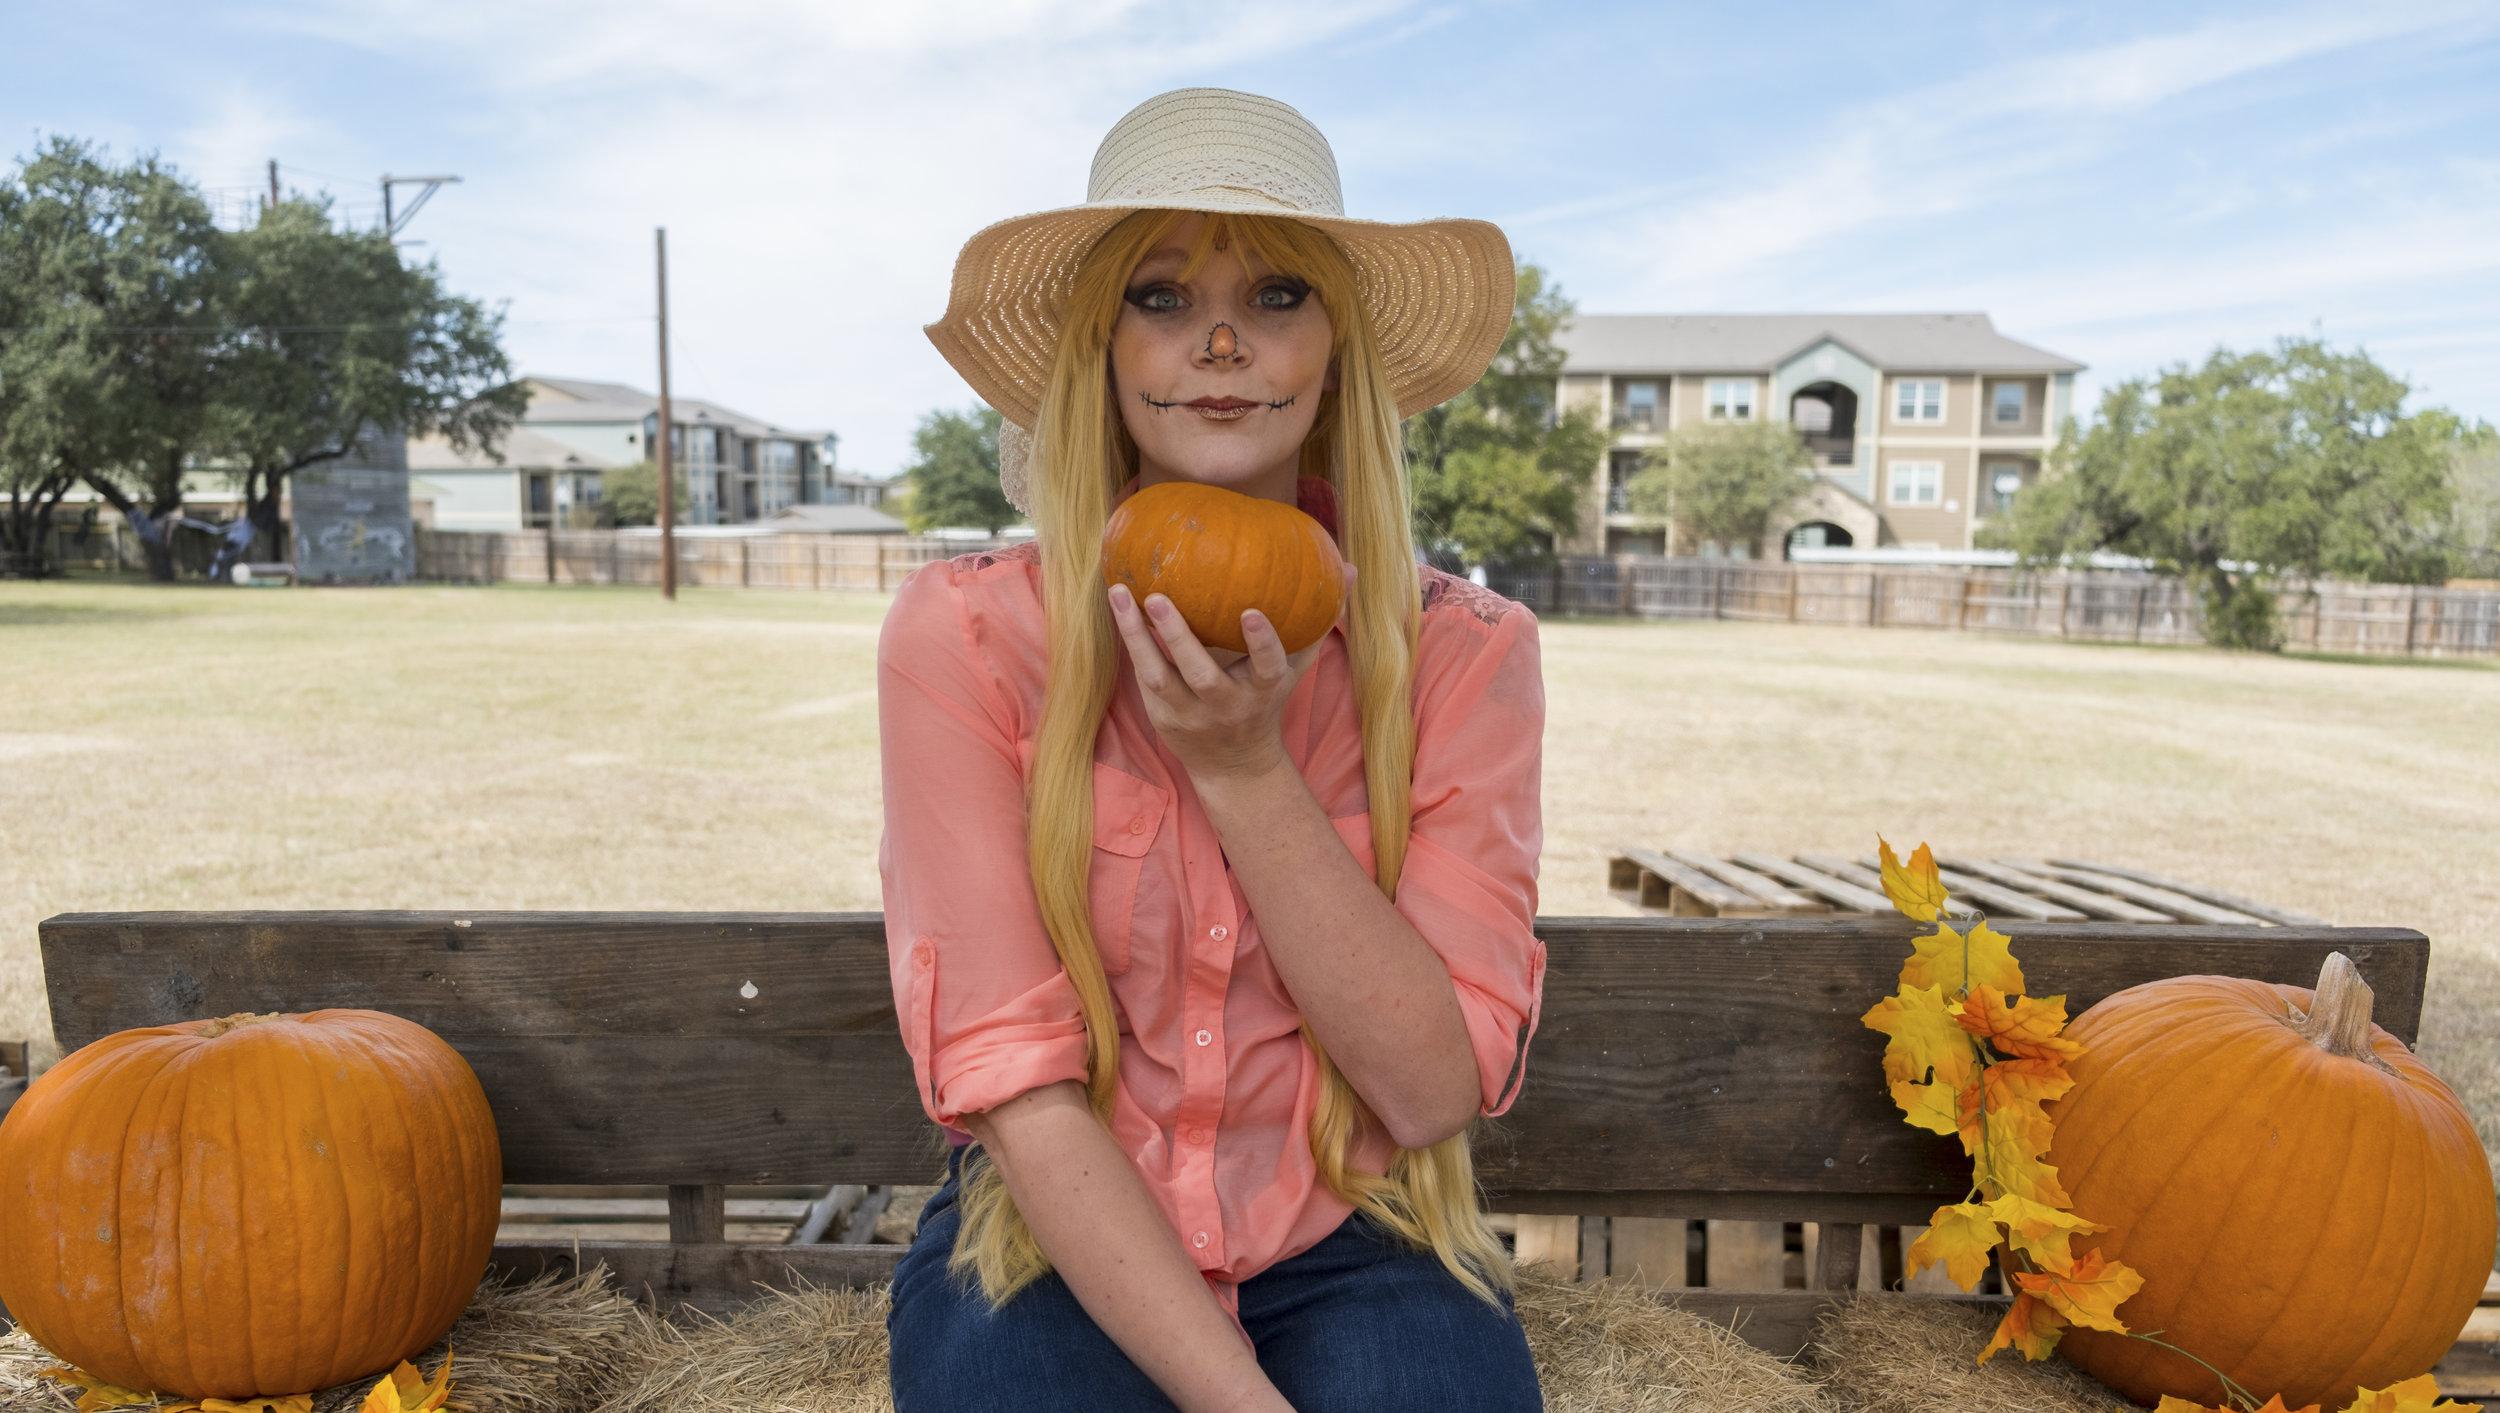 Allybelle Cosplay in Minako Aino cosplay in San Antonio